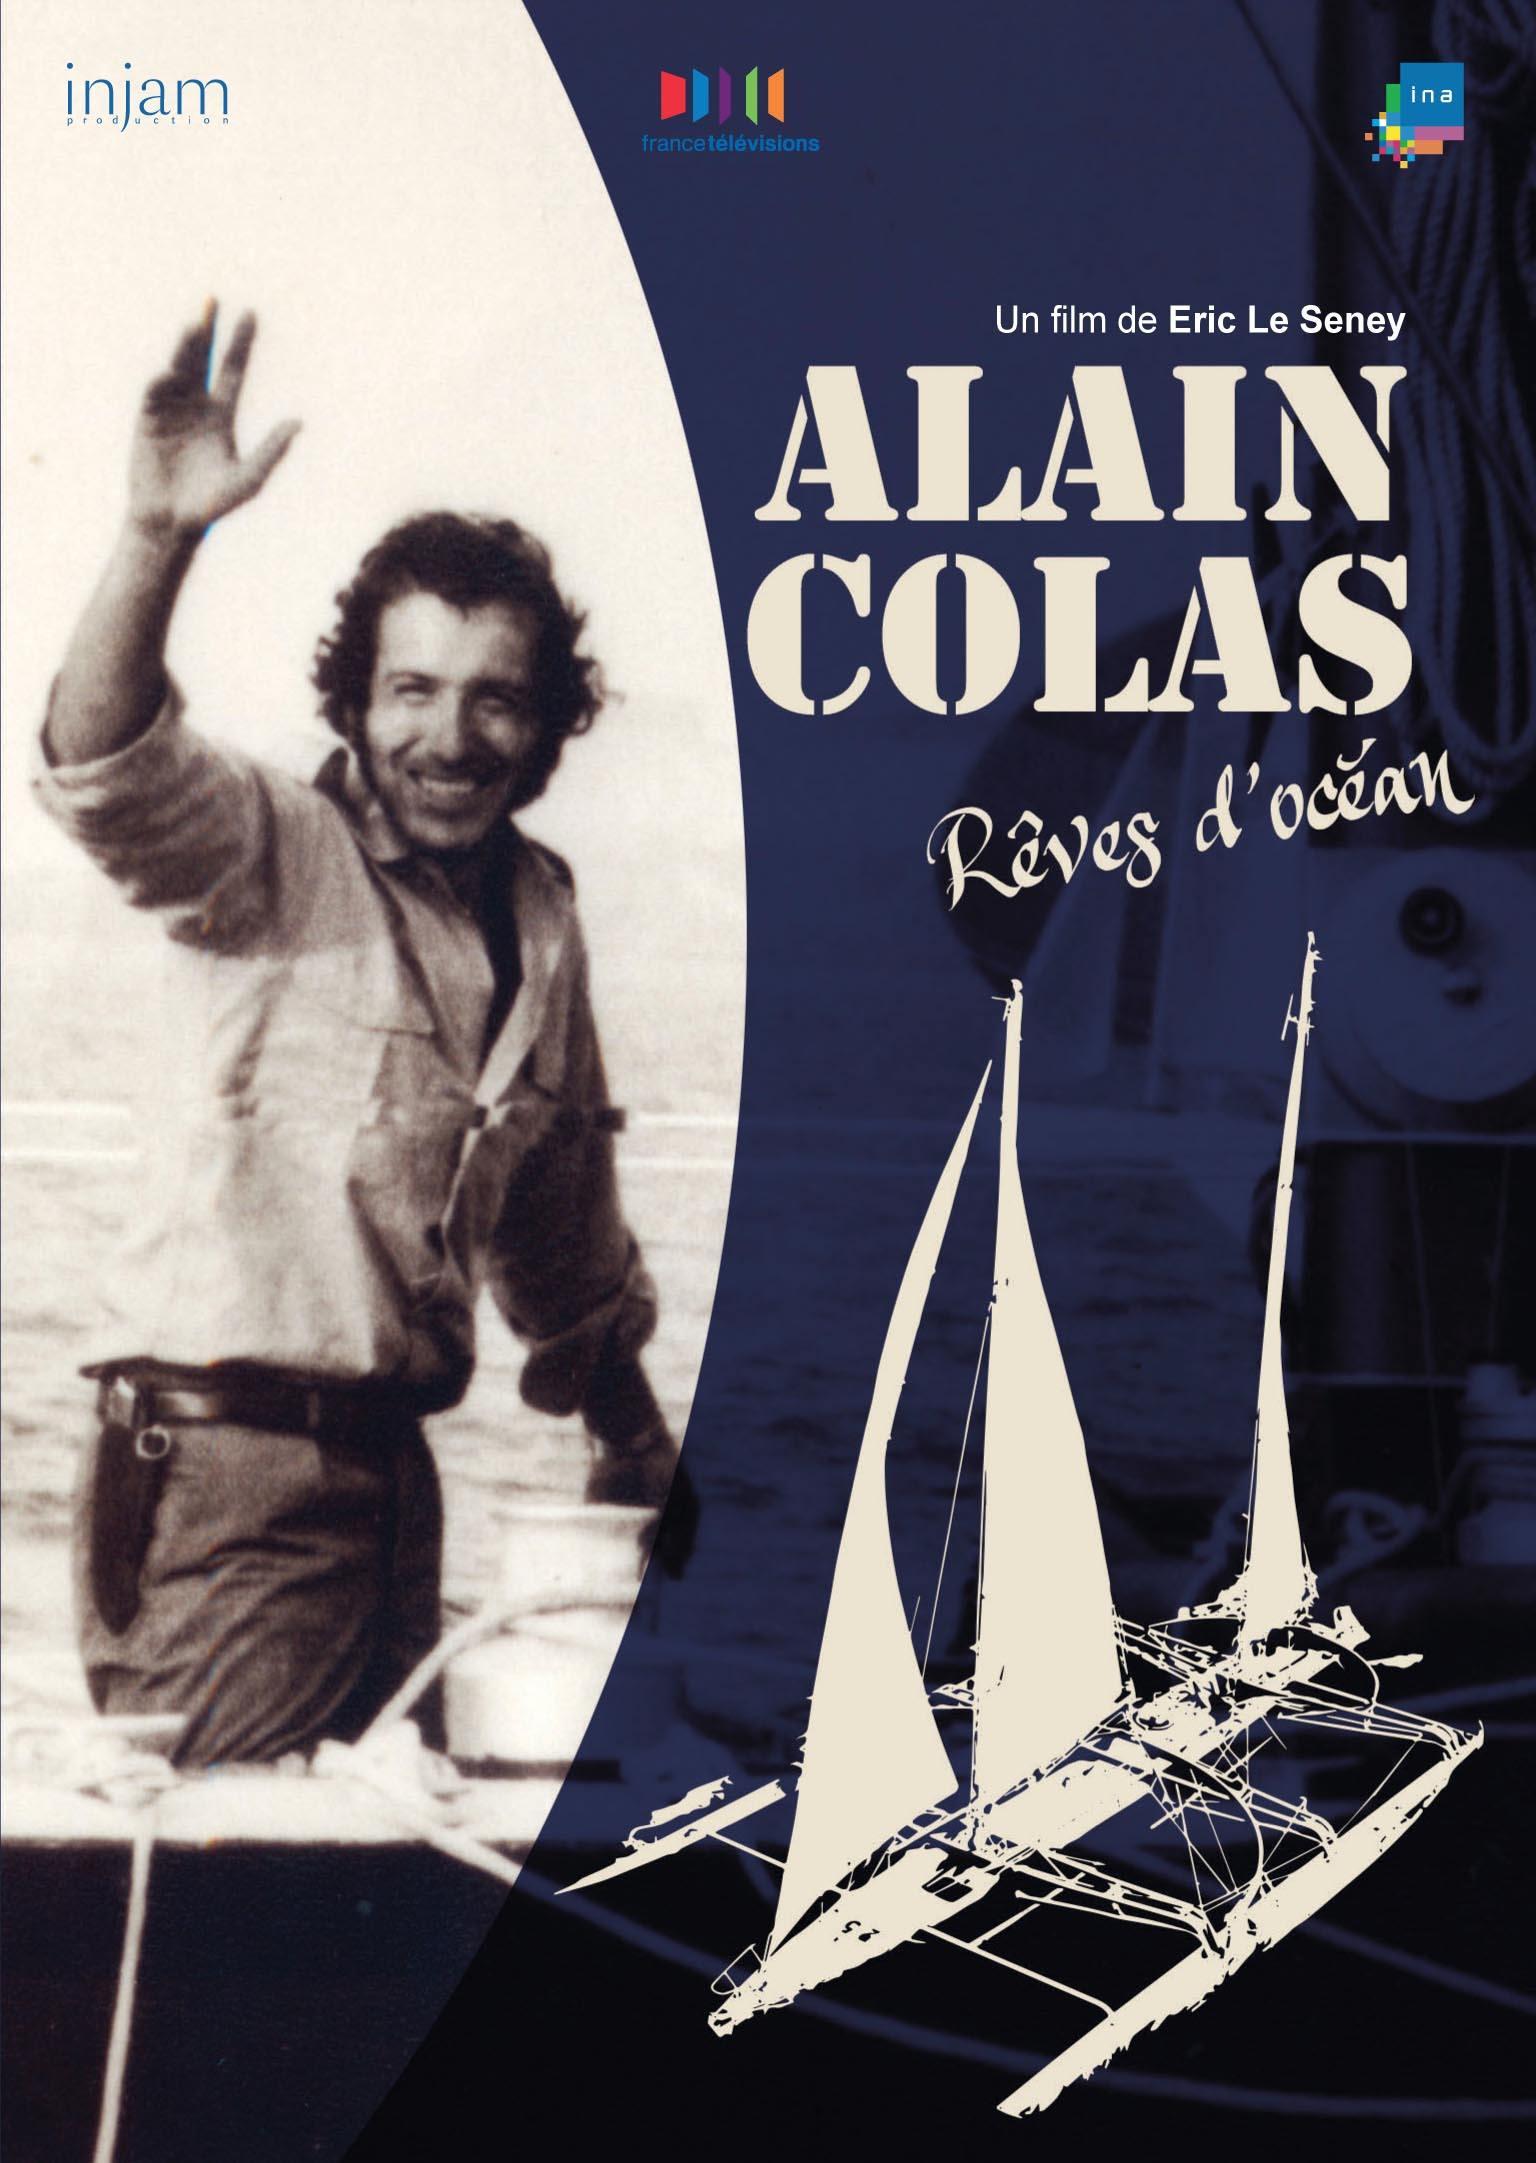 Alain colas - dvd